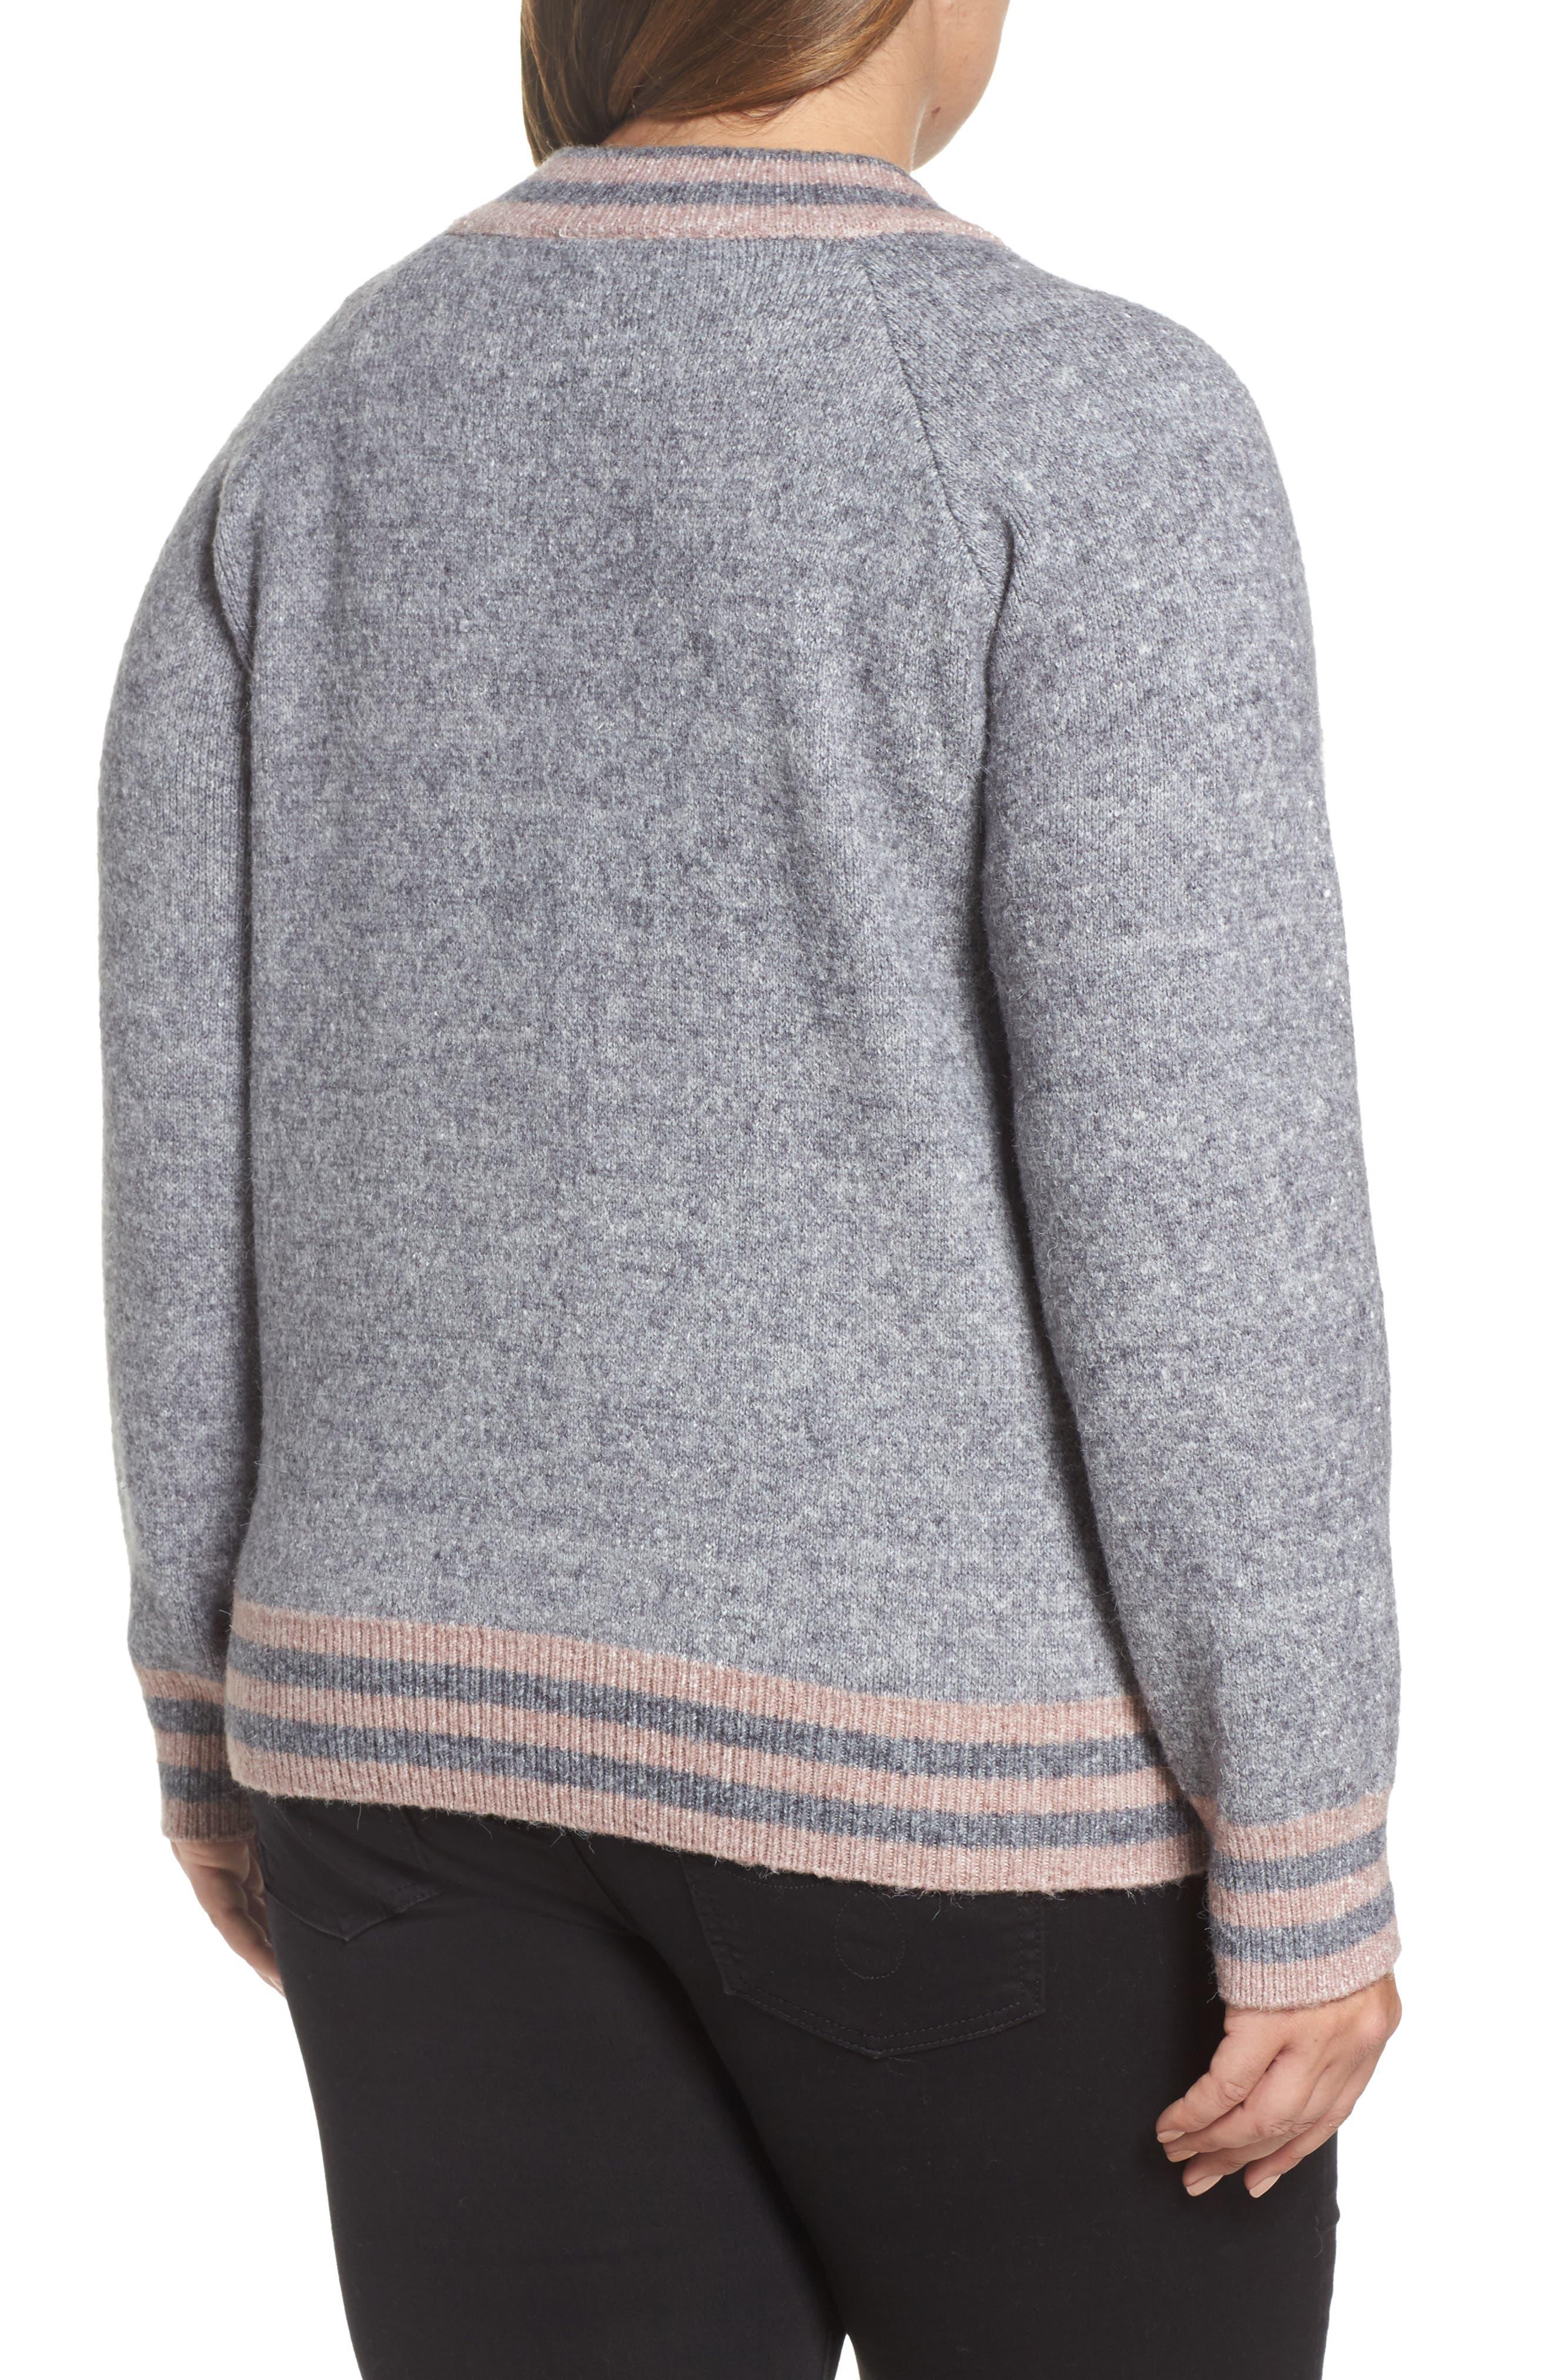 Zanja Embroidered Knit Bomber Jacket,                             Alternate thumbnail 2, color,                             Medium Grey Melange